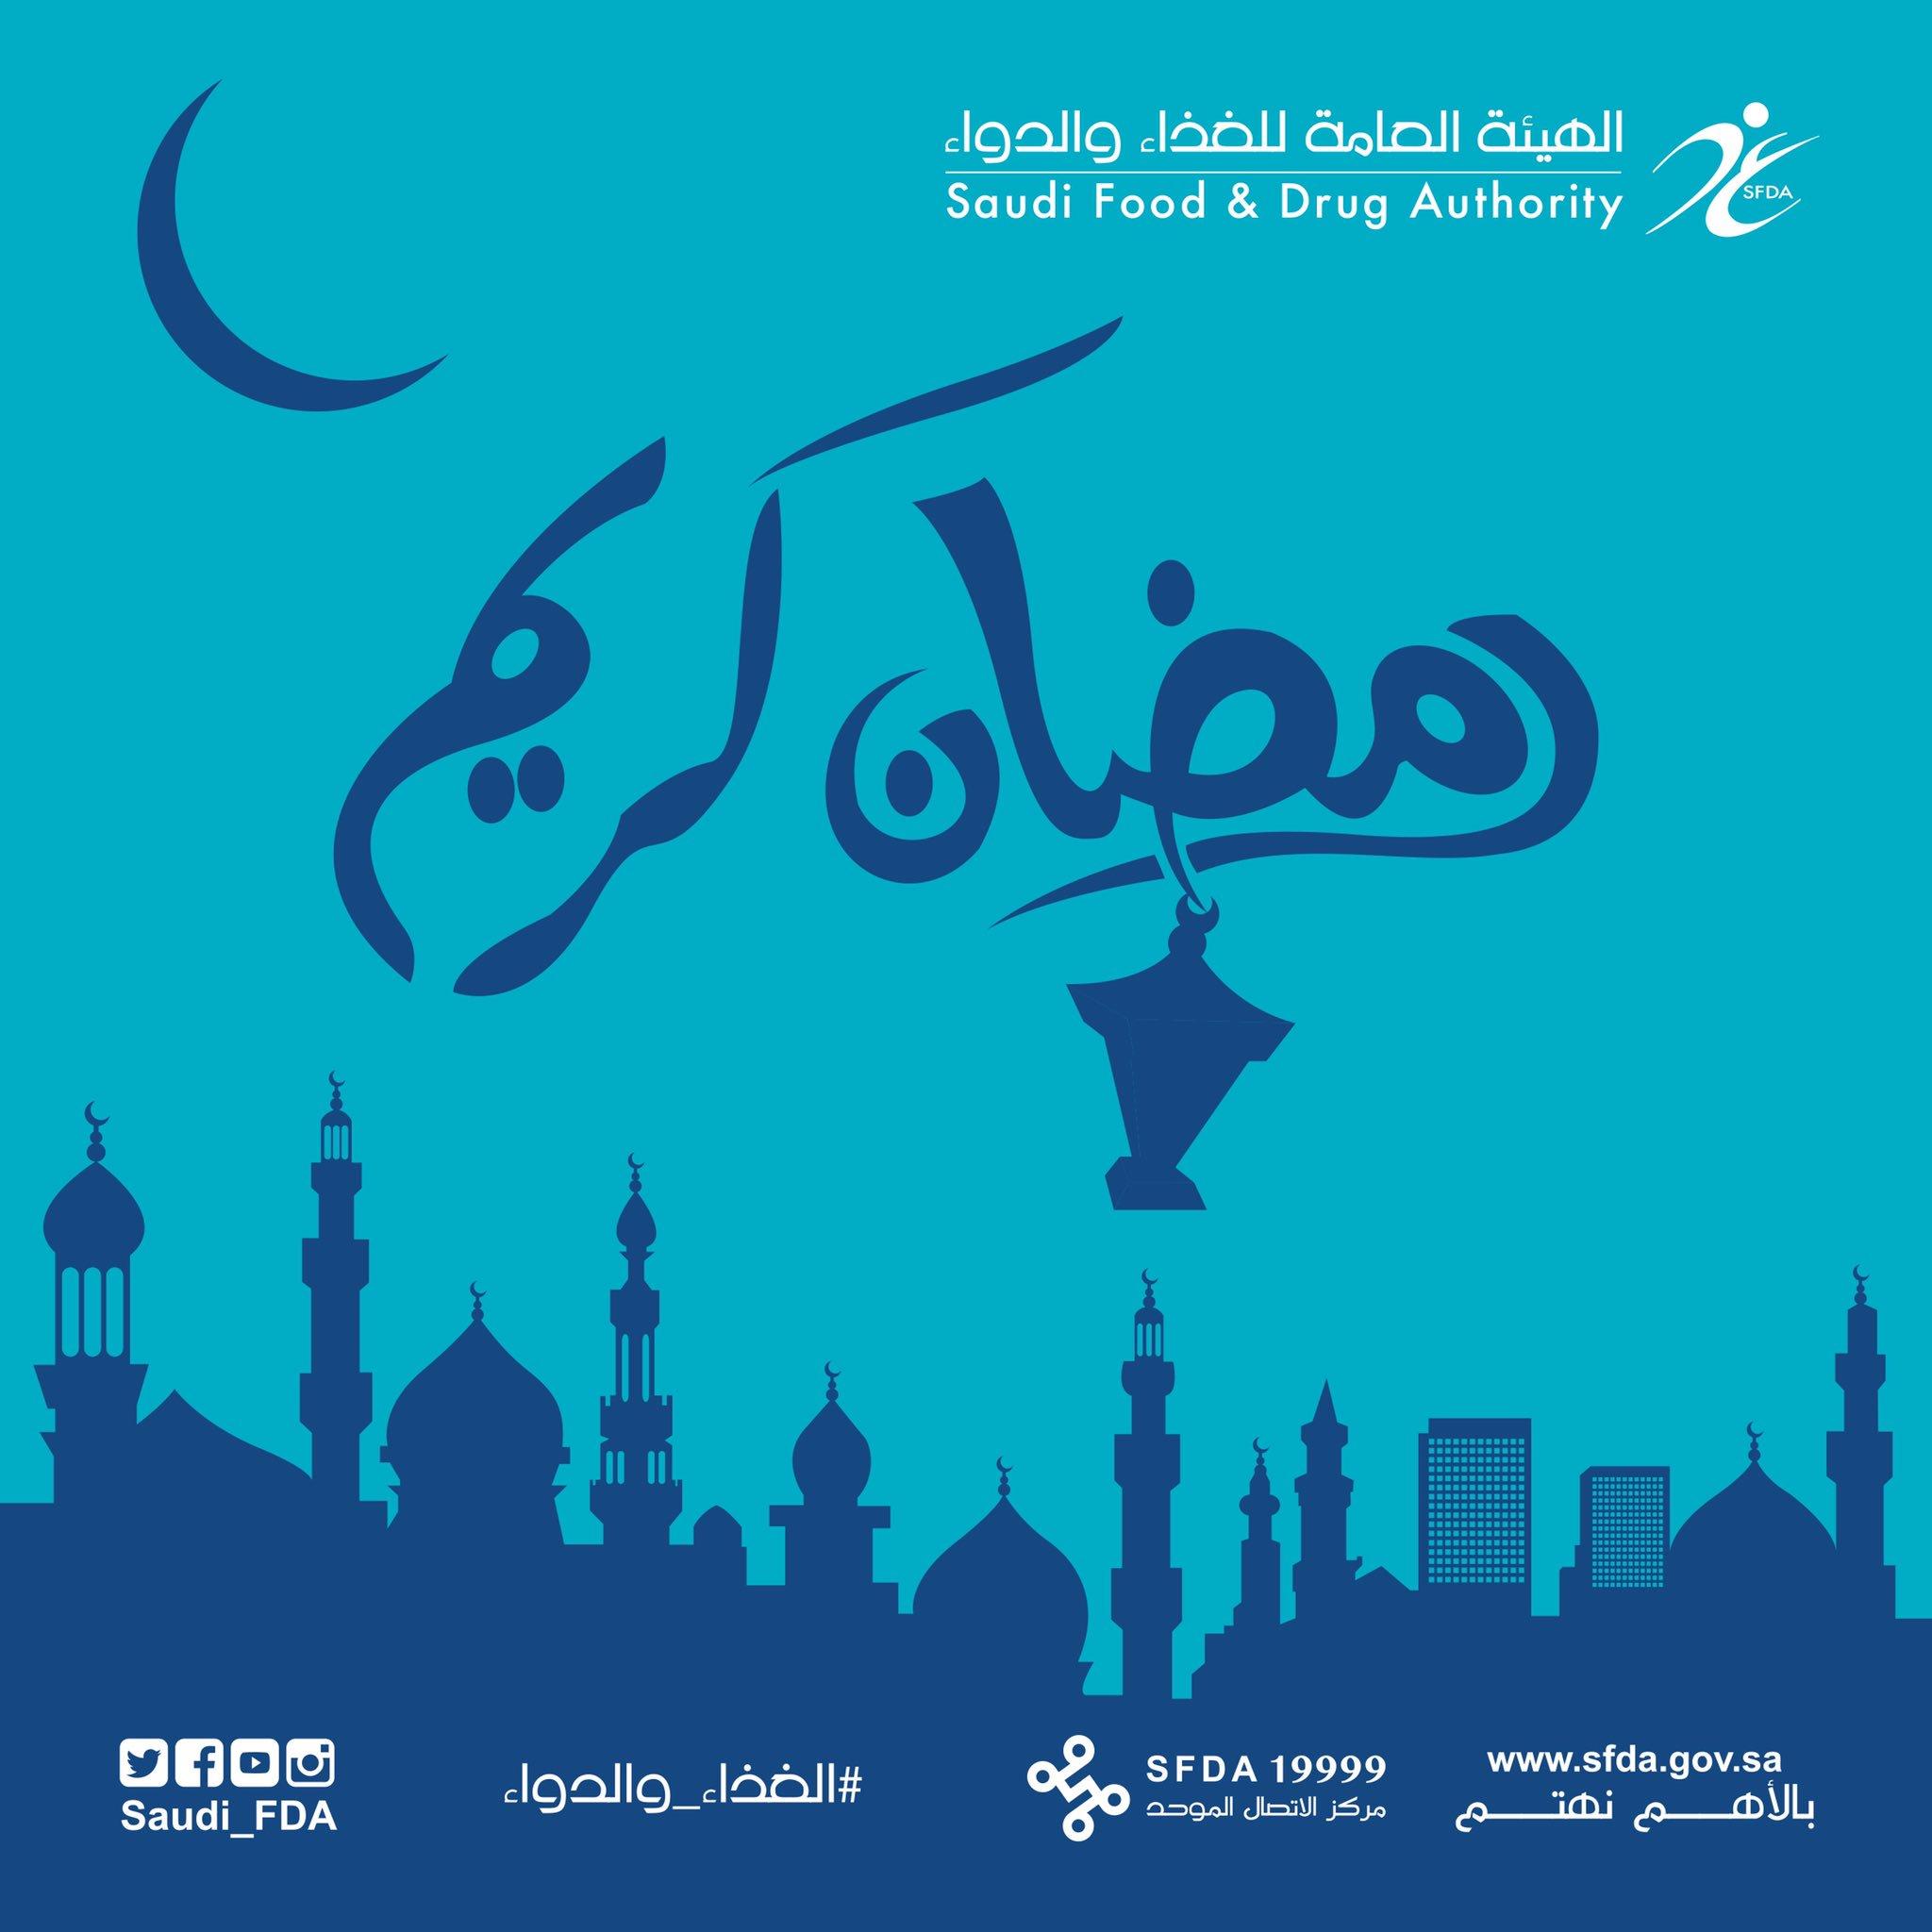 Saudi_FDA_2017-May-26.jpg